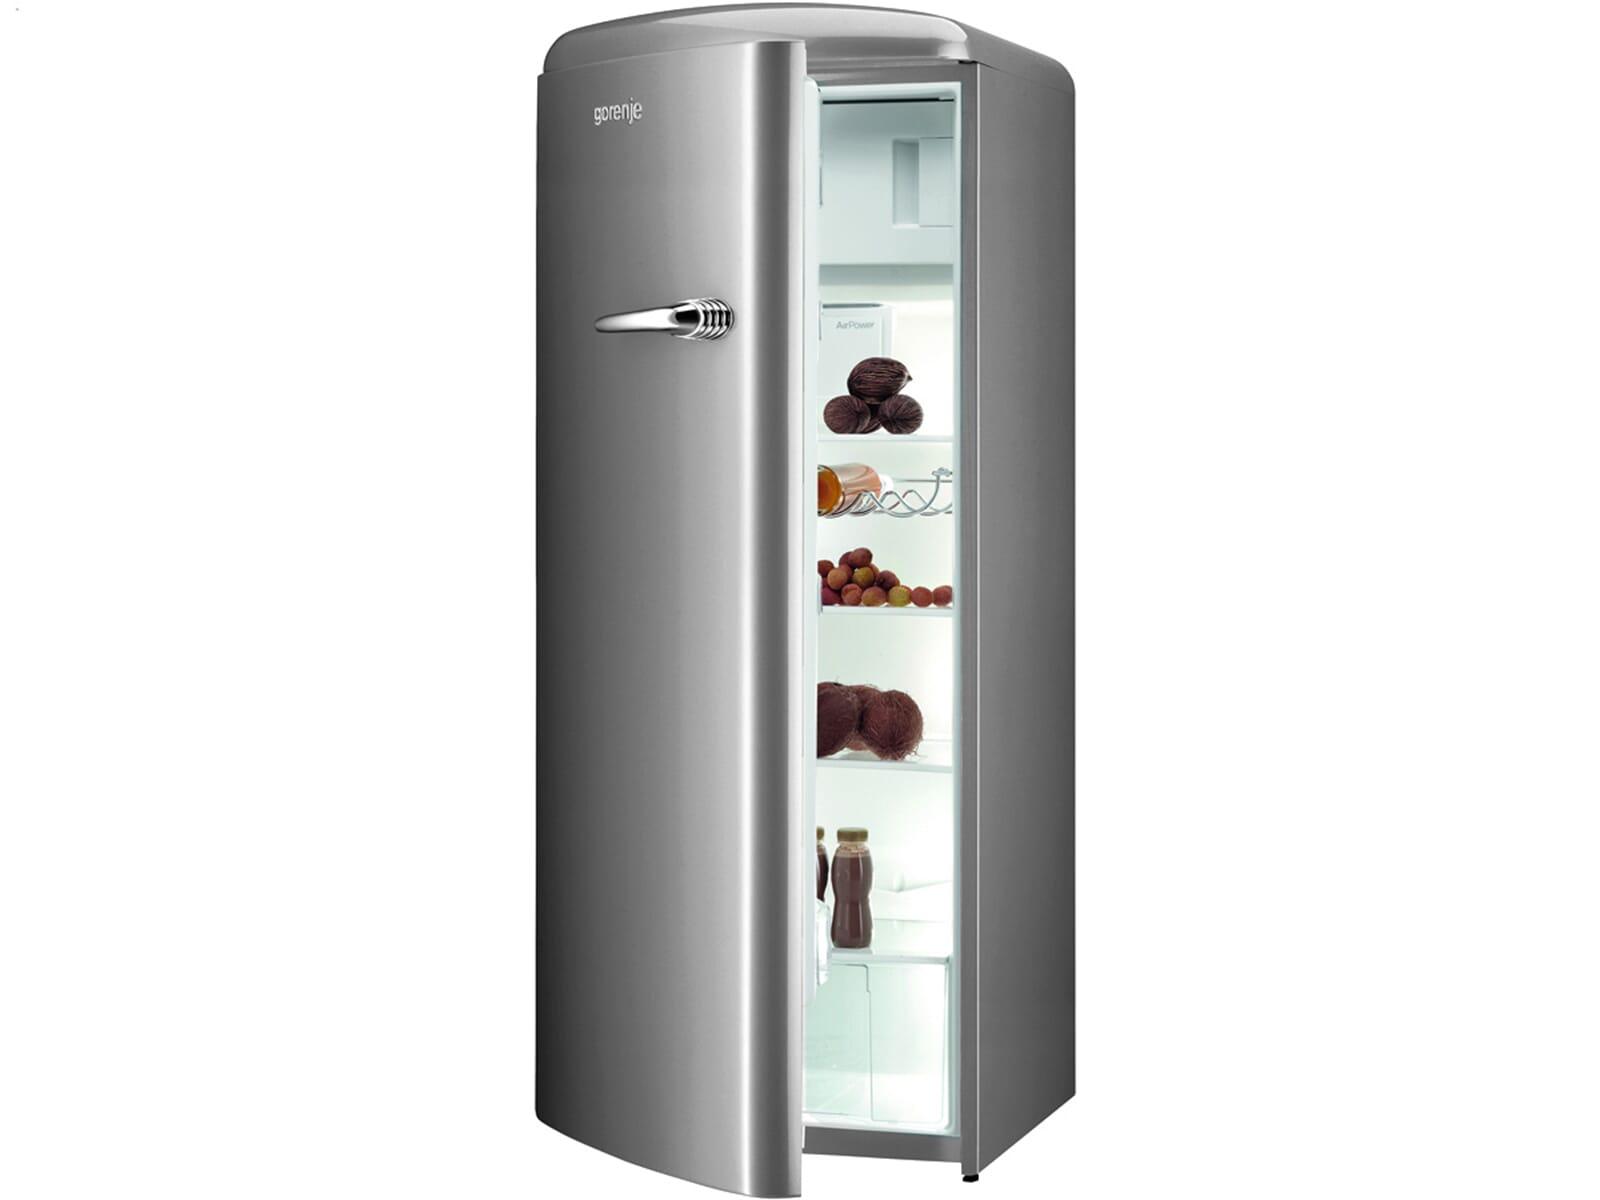 Aeg Kühlschrank Wasser : Aeg kühlschrank wasser läuft nicht ab aeg kühlschrank wasser